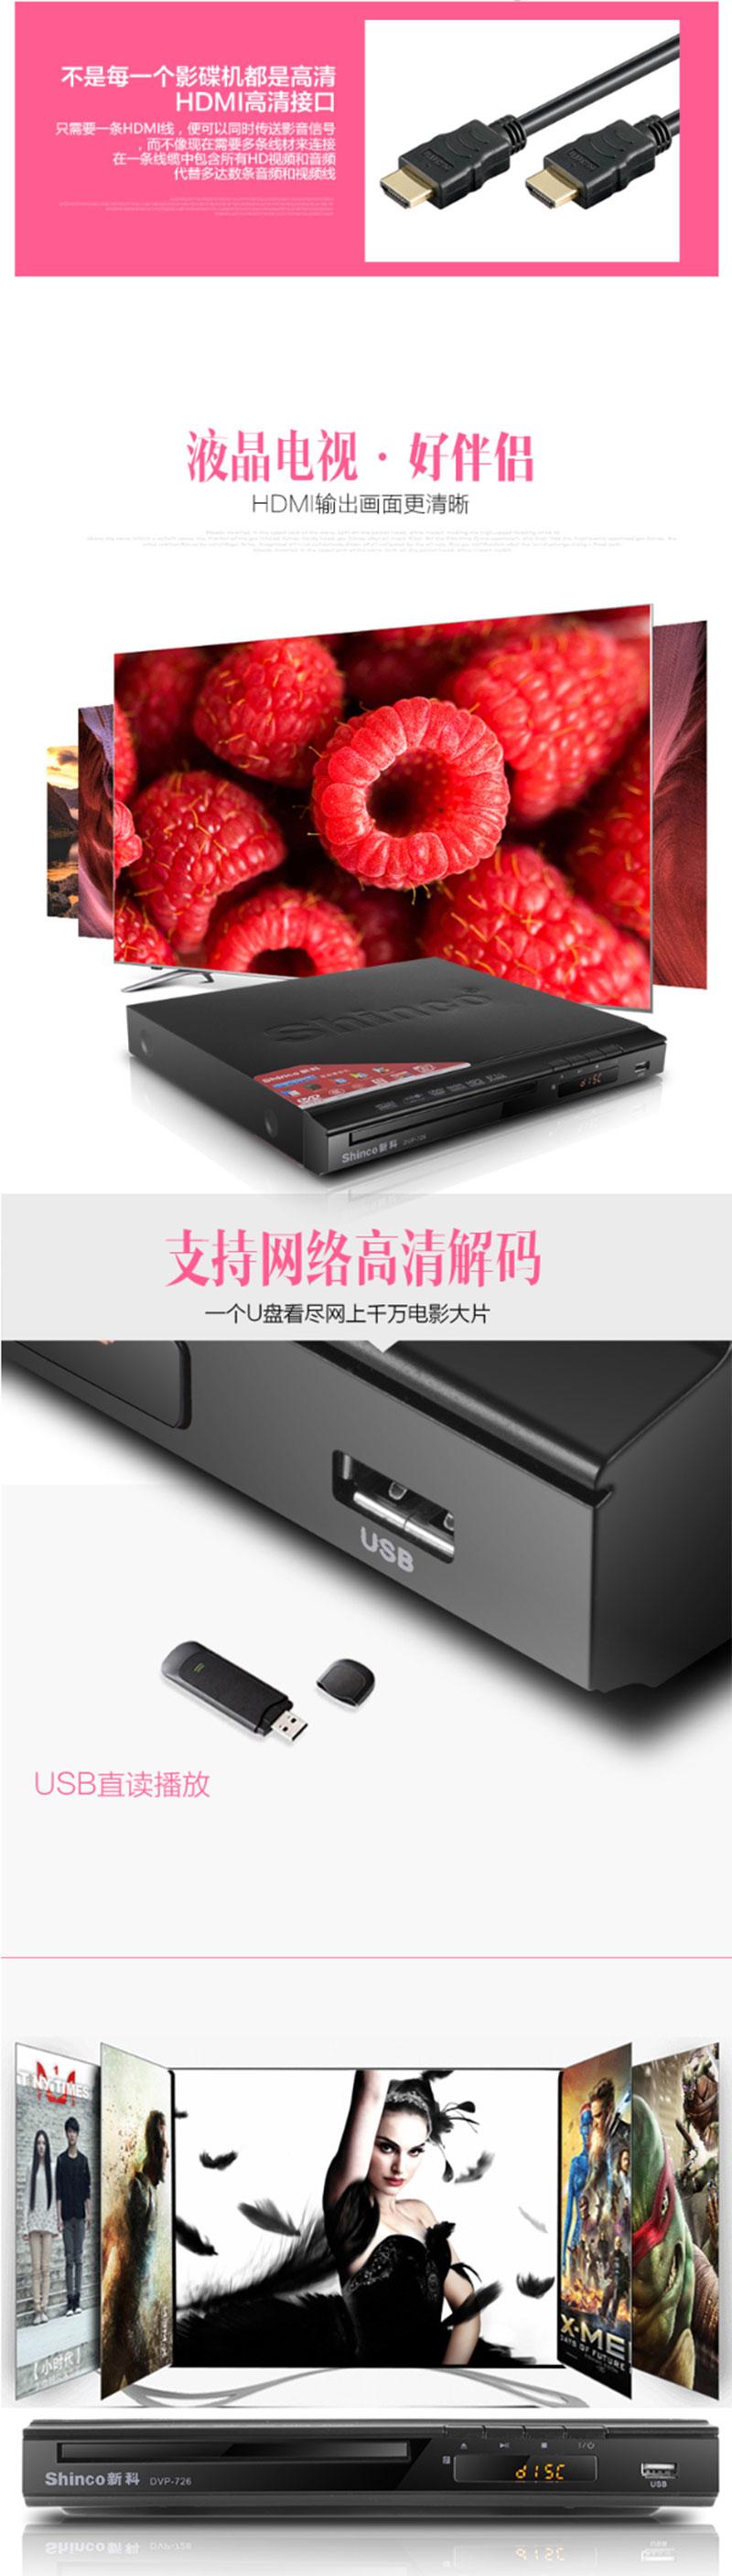 新科(Shinco)XK-101 VCD 播放机影碟机